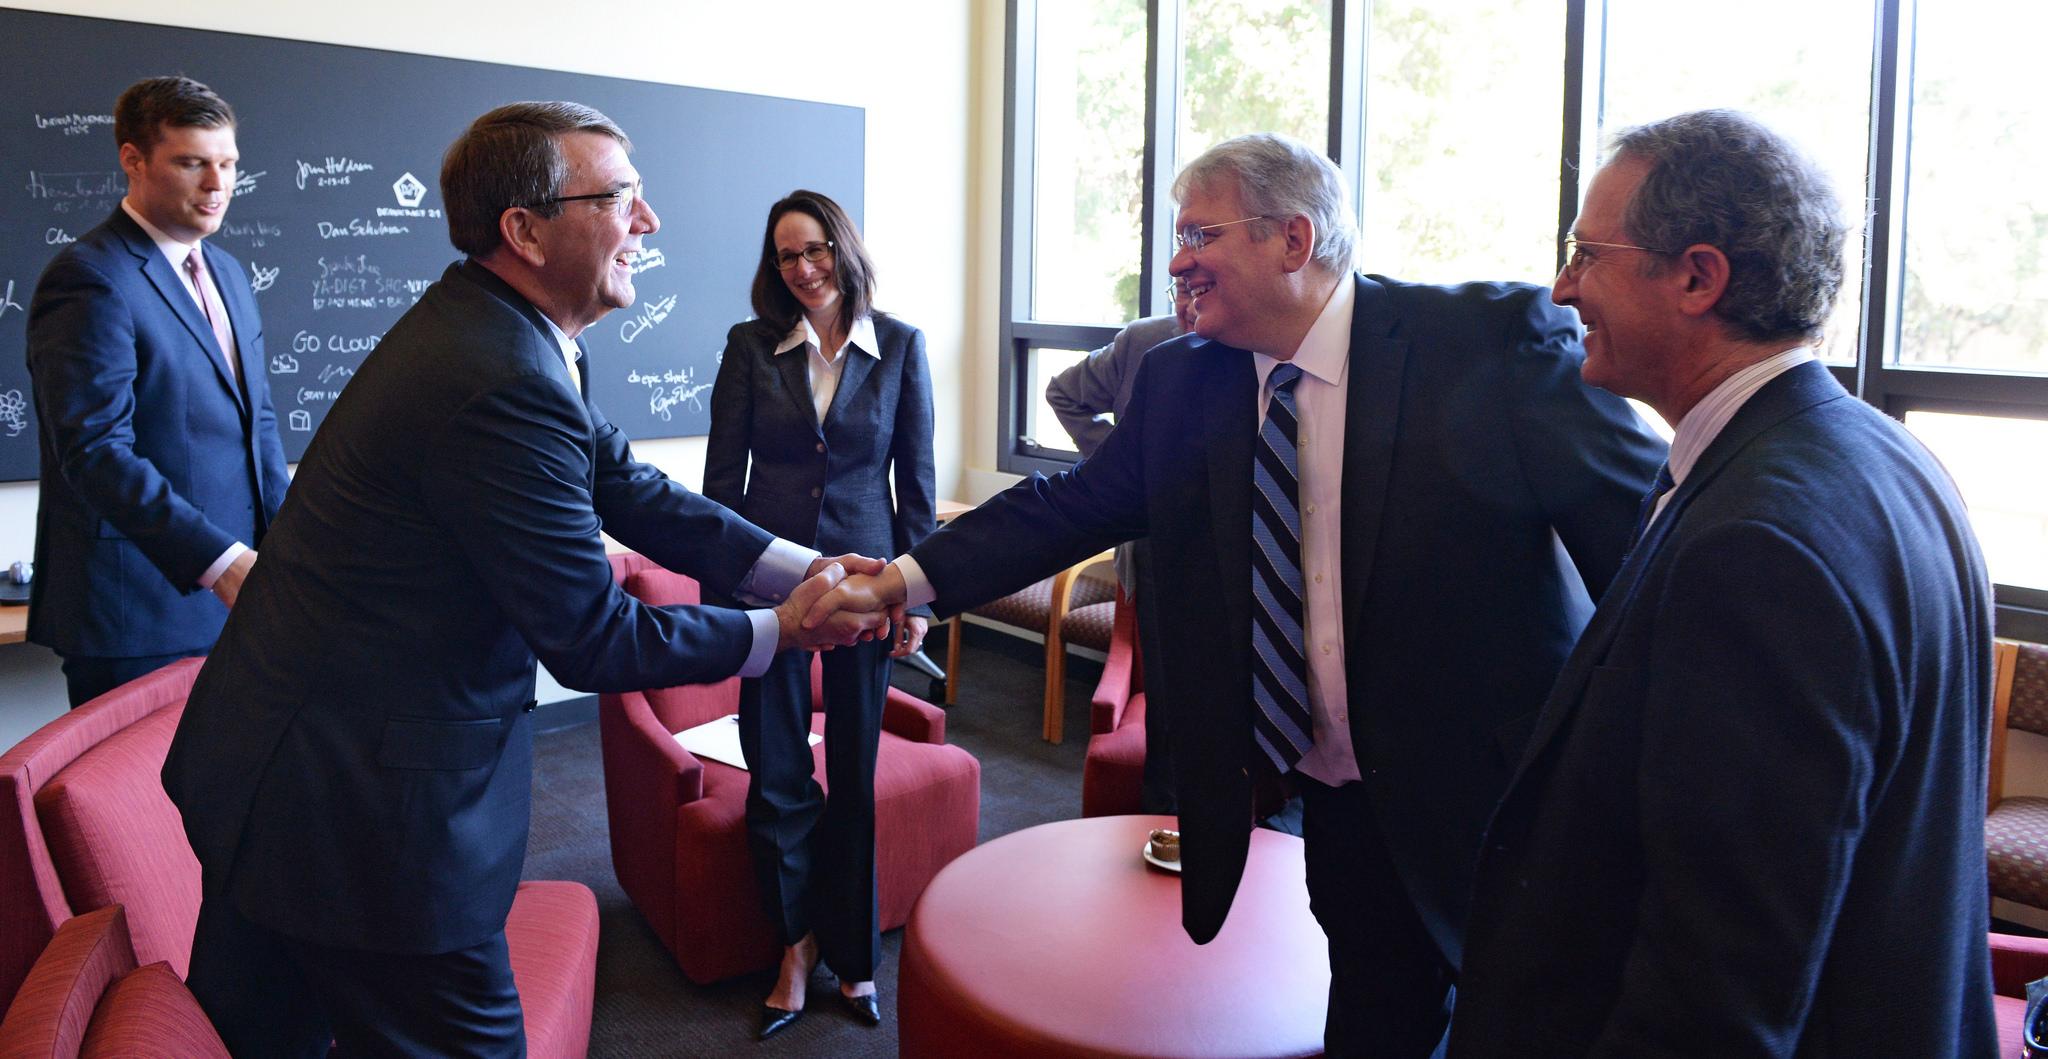 Defense Secretary Ash Carter, left, shakes hands with John